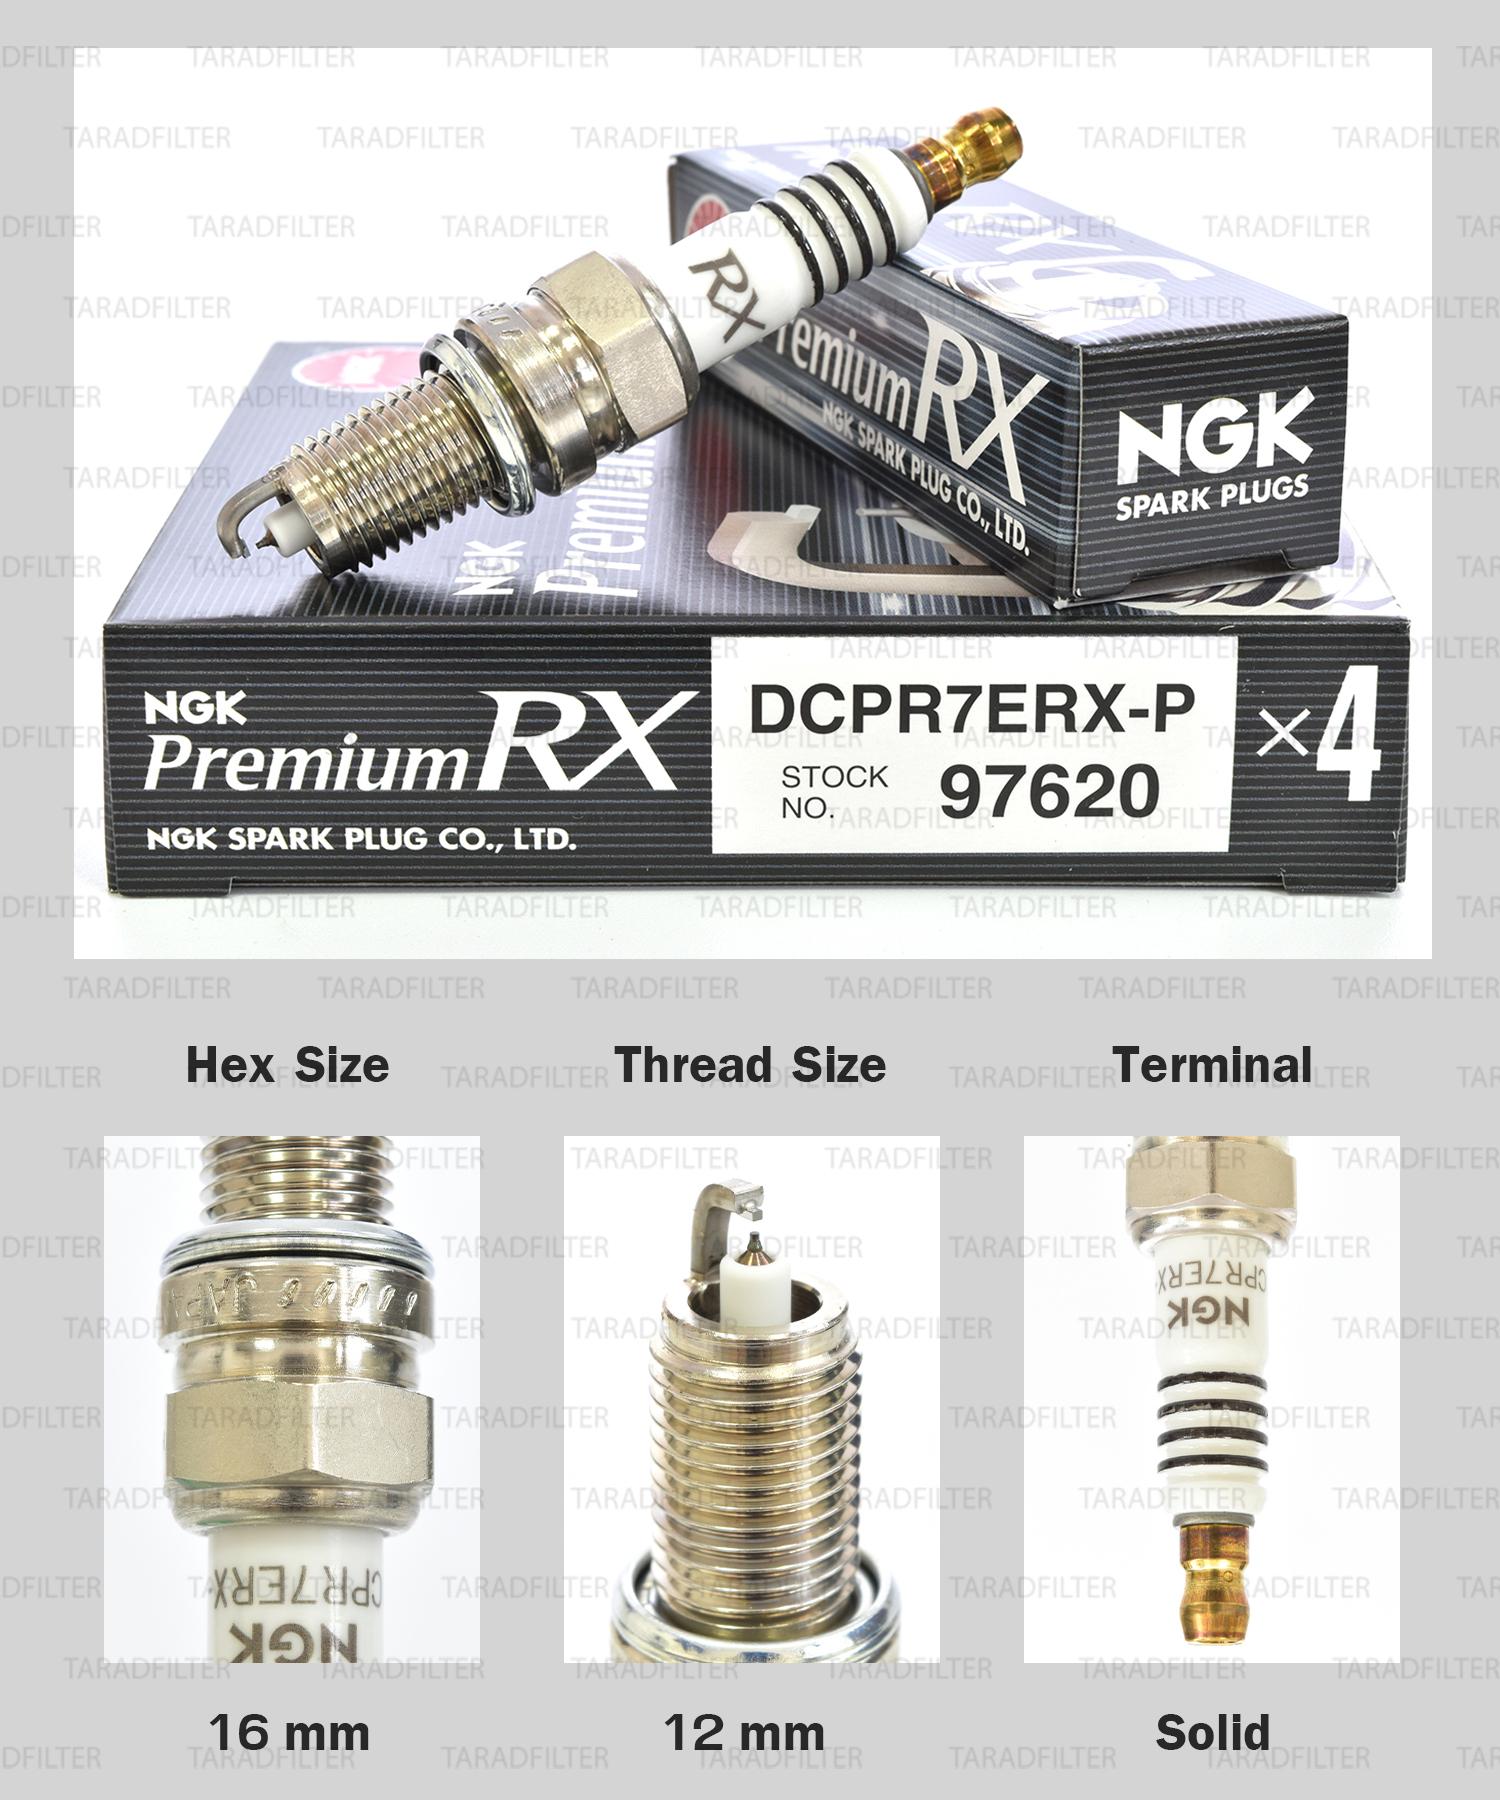 DCPR7ERX-P